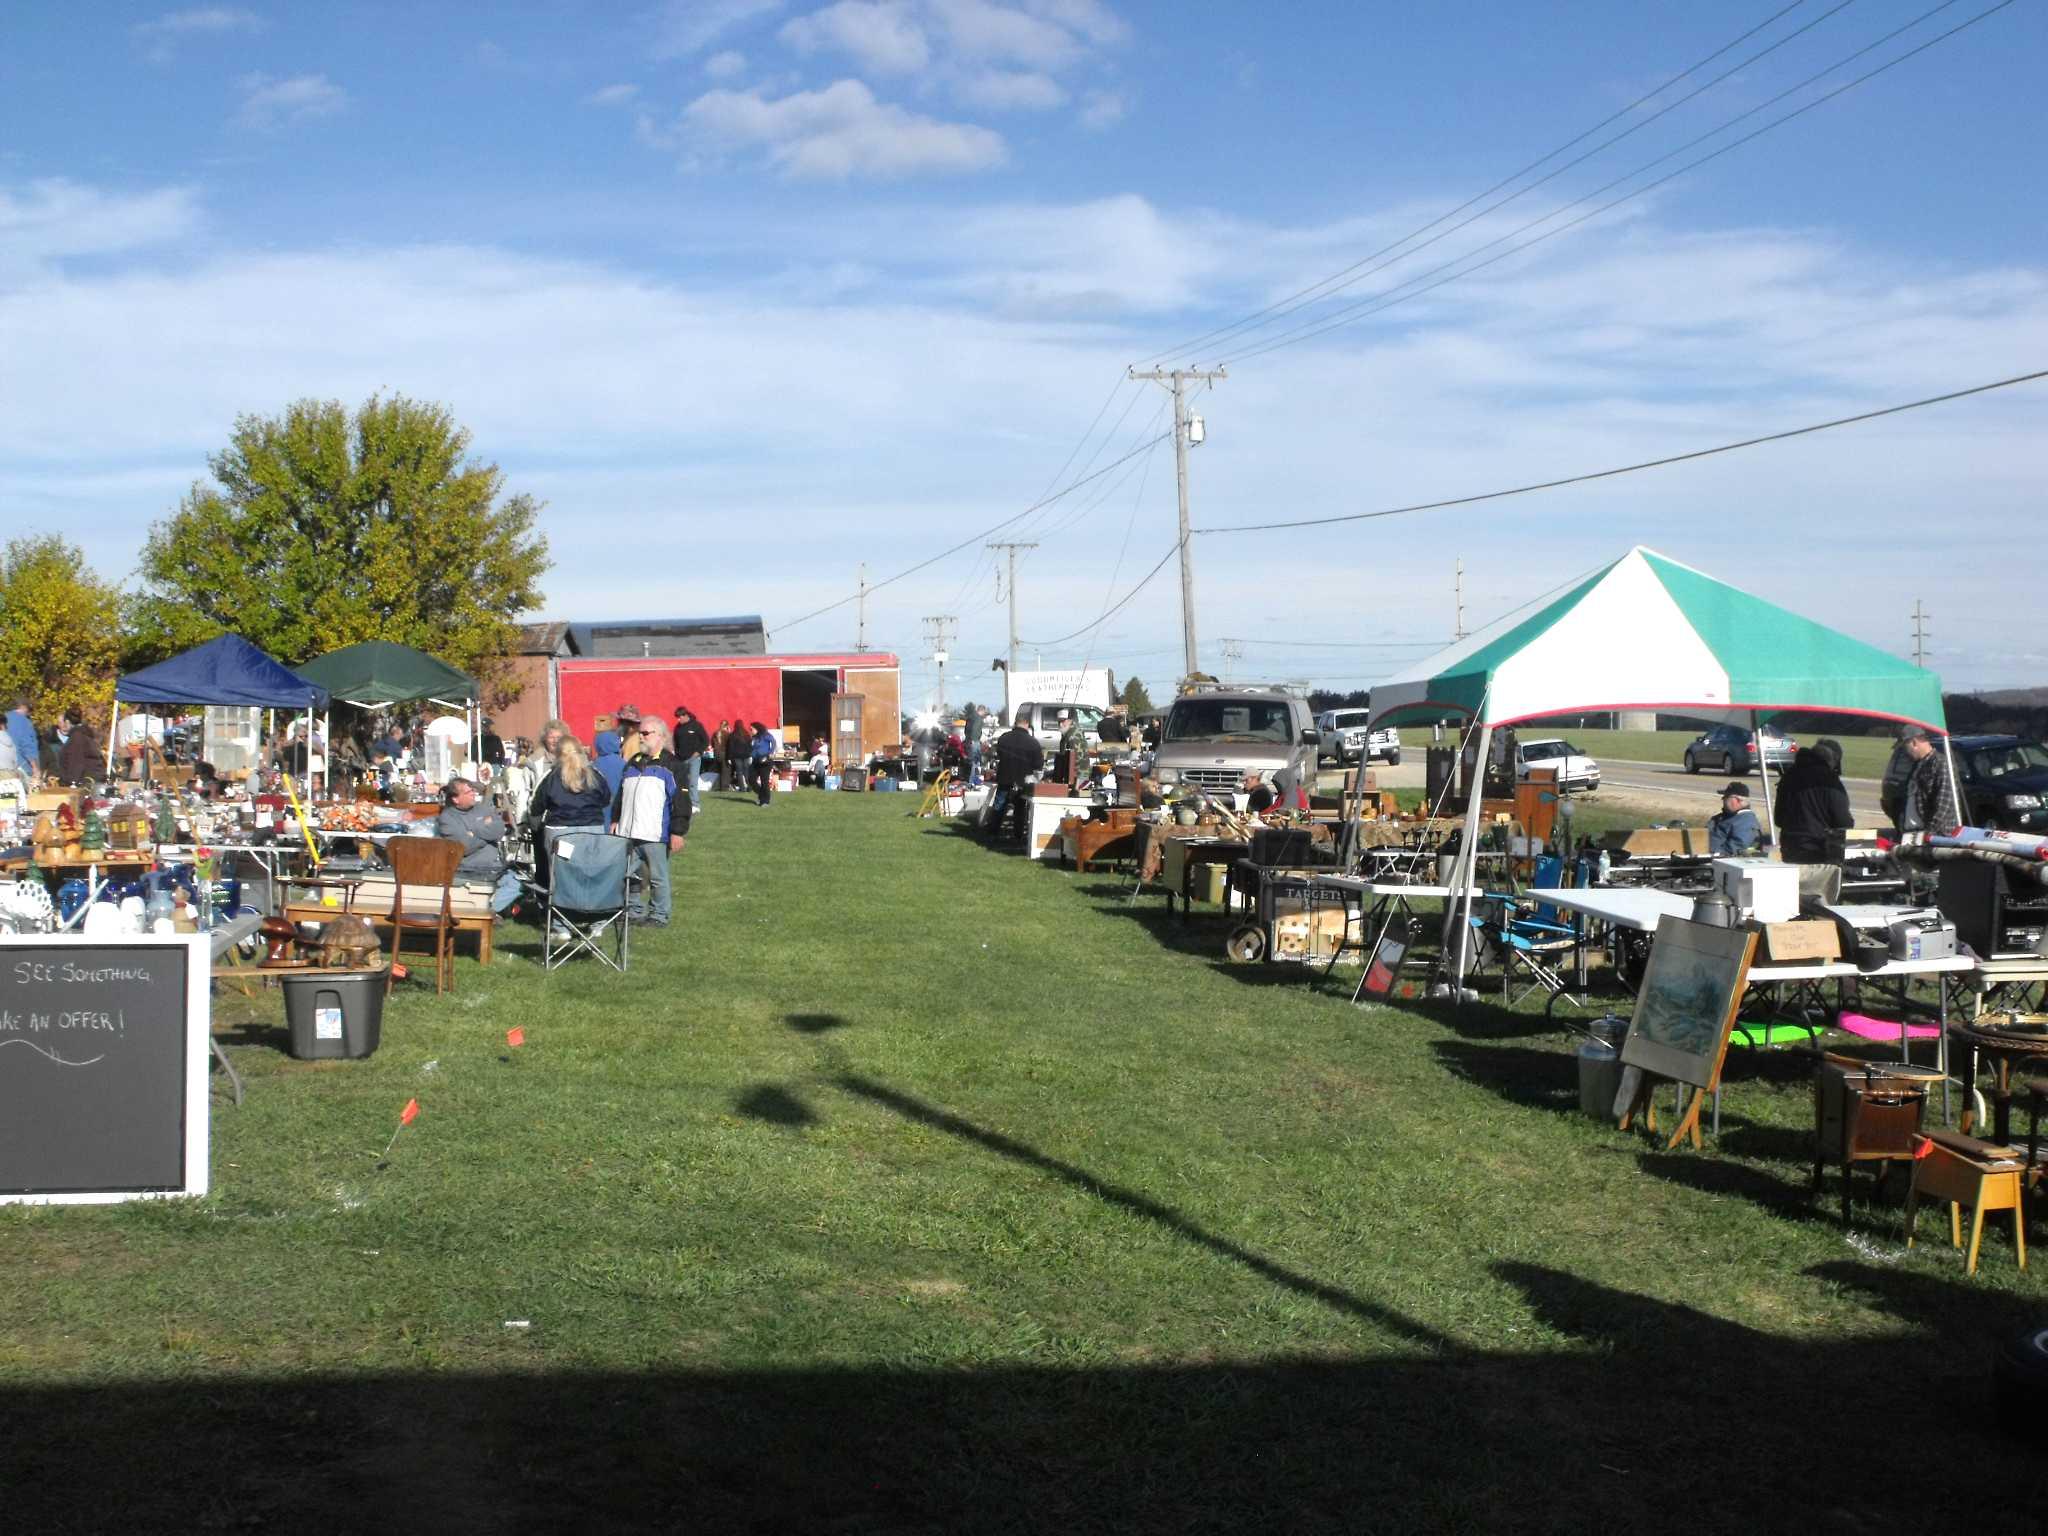 Outdoor flea market photo s august 2012 outdoor flea market photo s